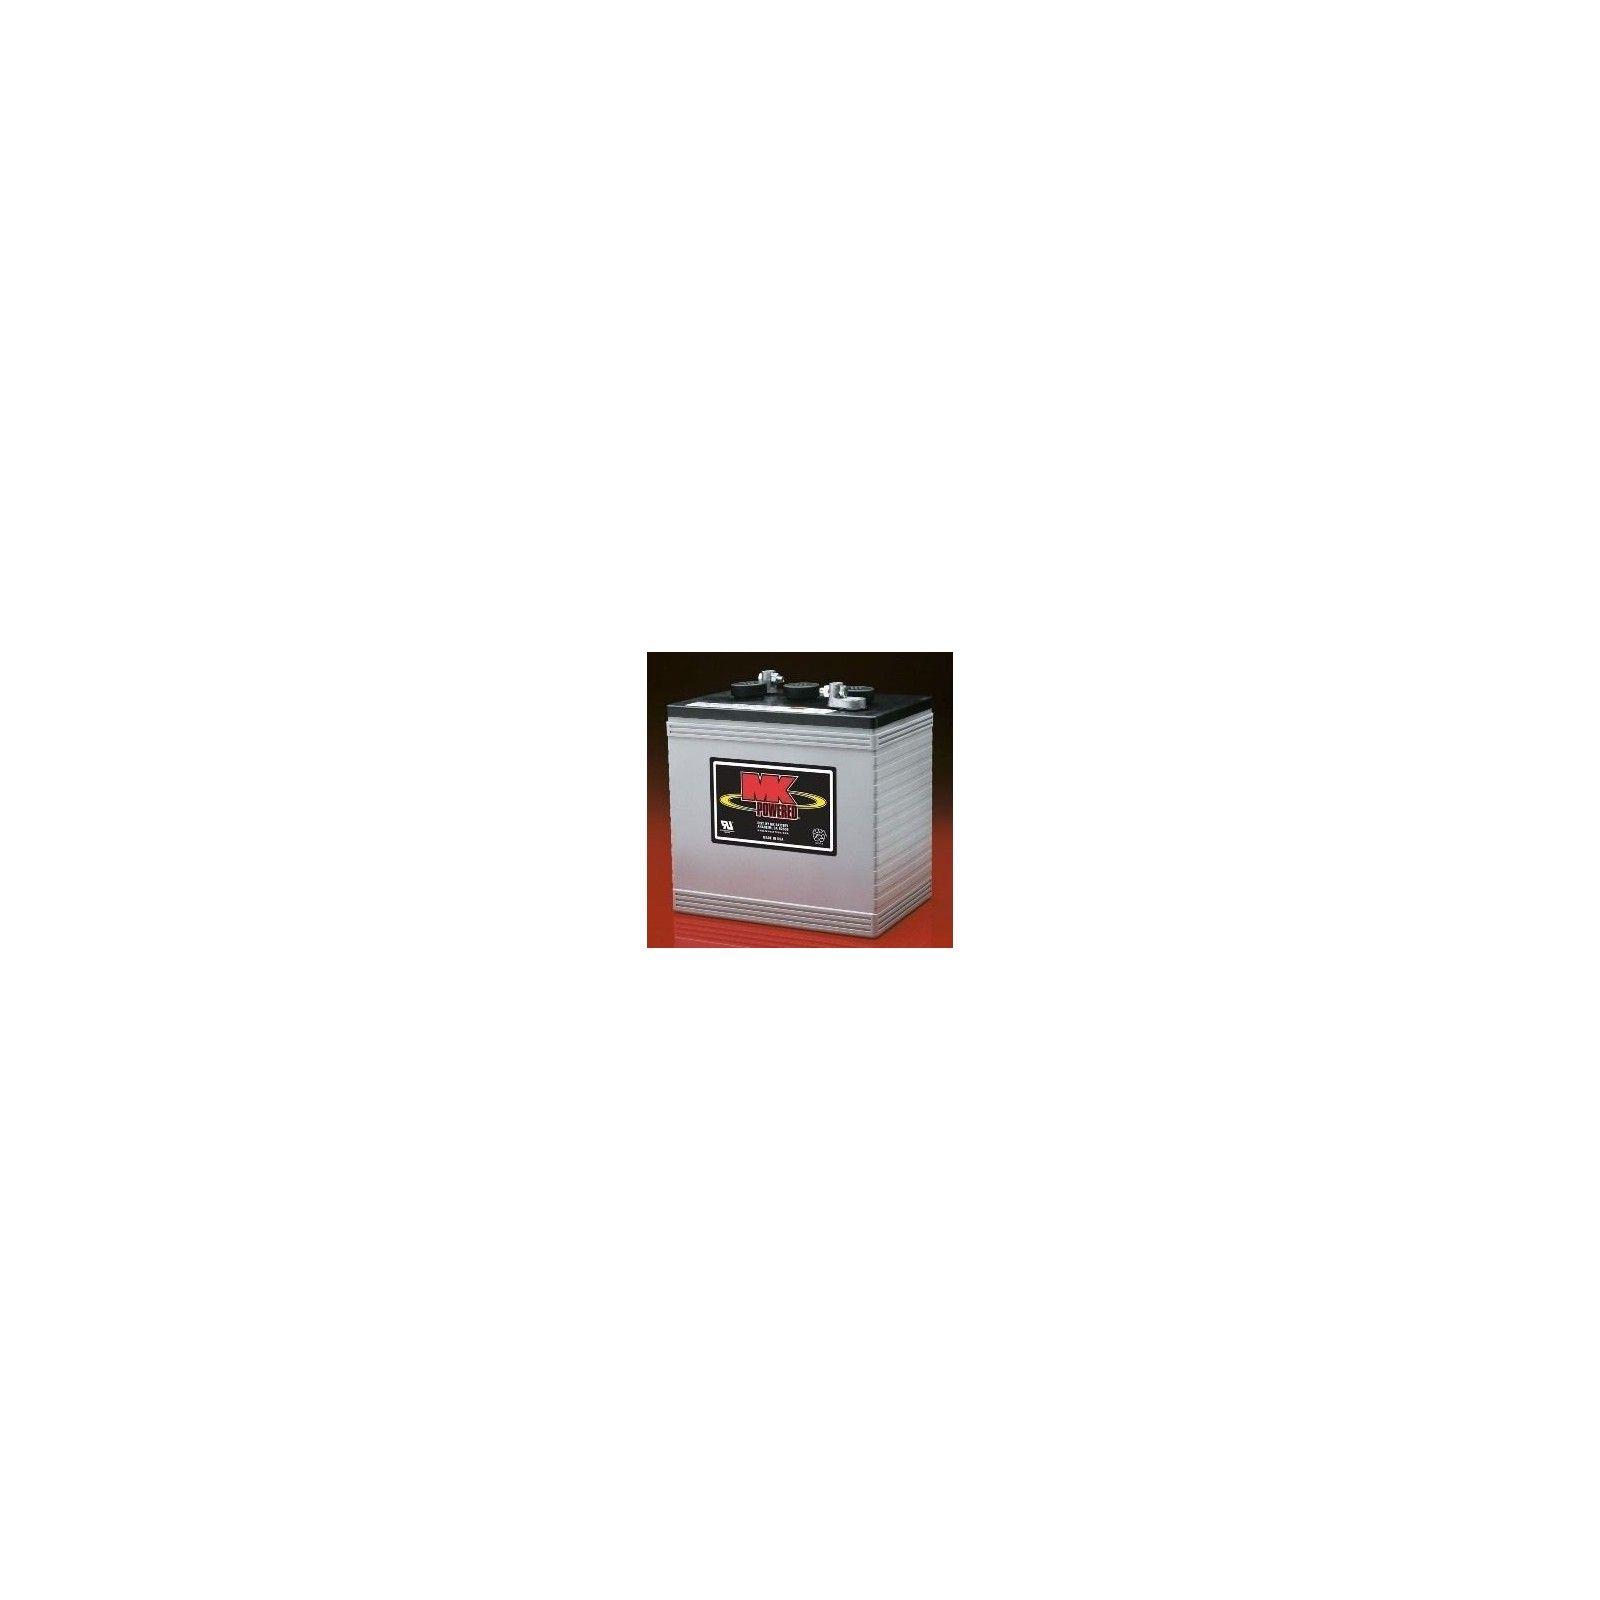 Batería MK 8AGC2 190Ah 6V Agm MK - 1